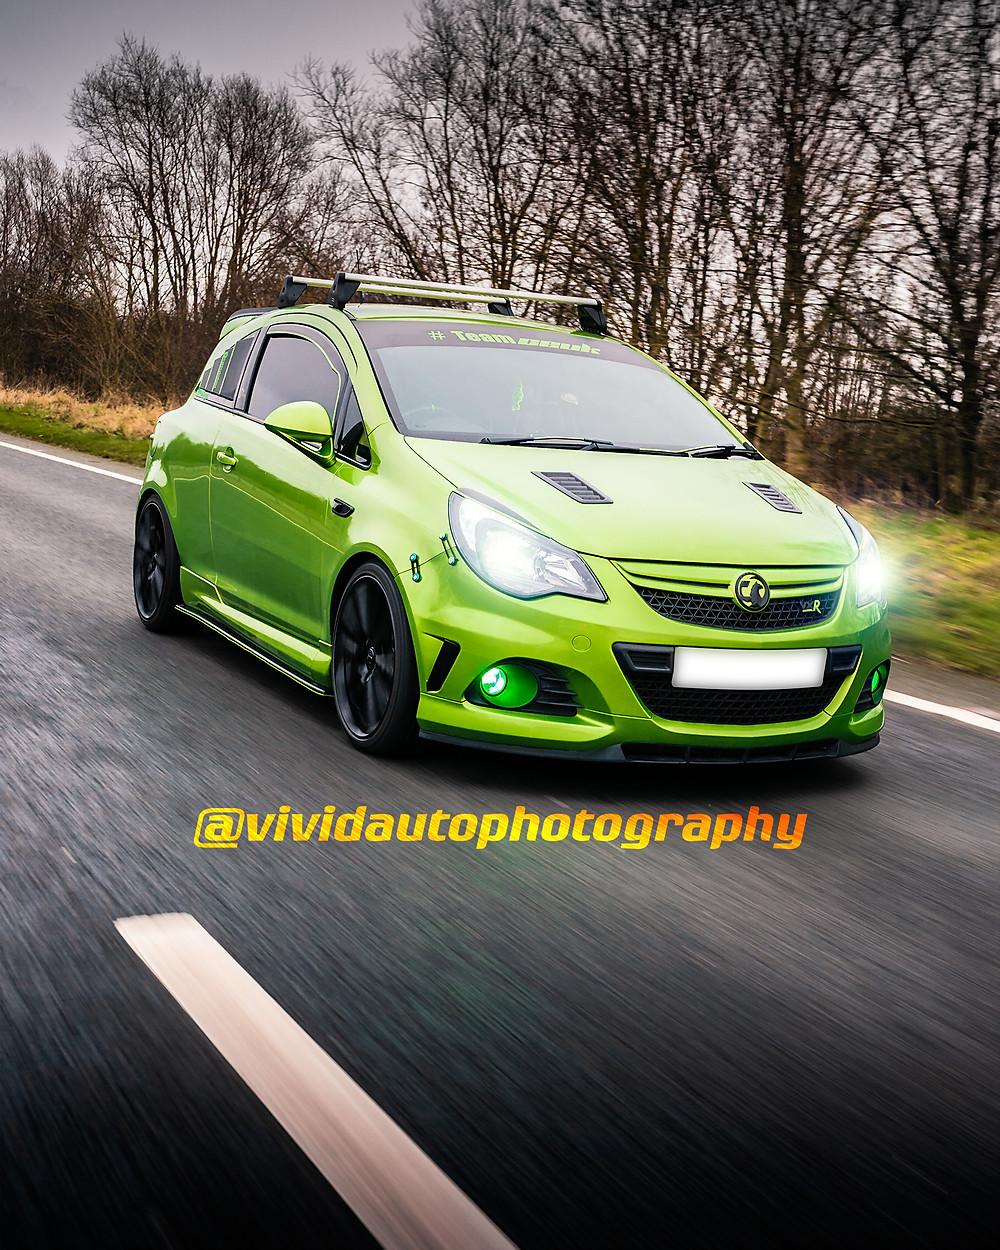 Vauxhall Corsa VXR Nurburgring Edition | Front three quarters rolling shot